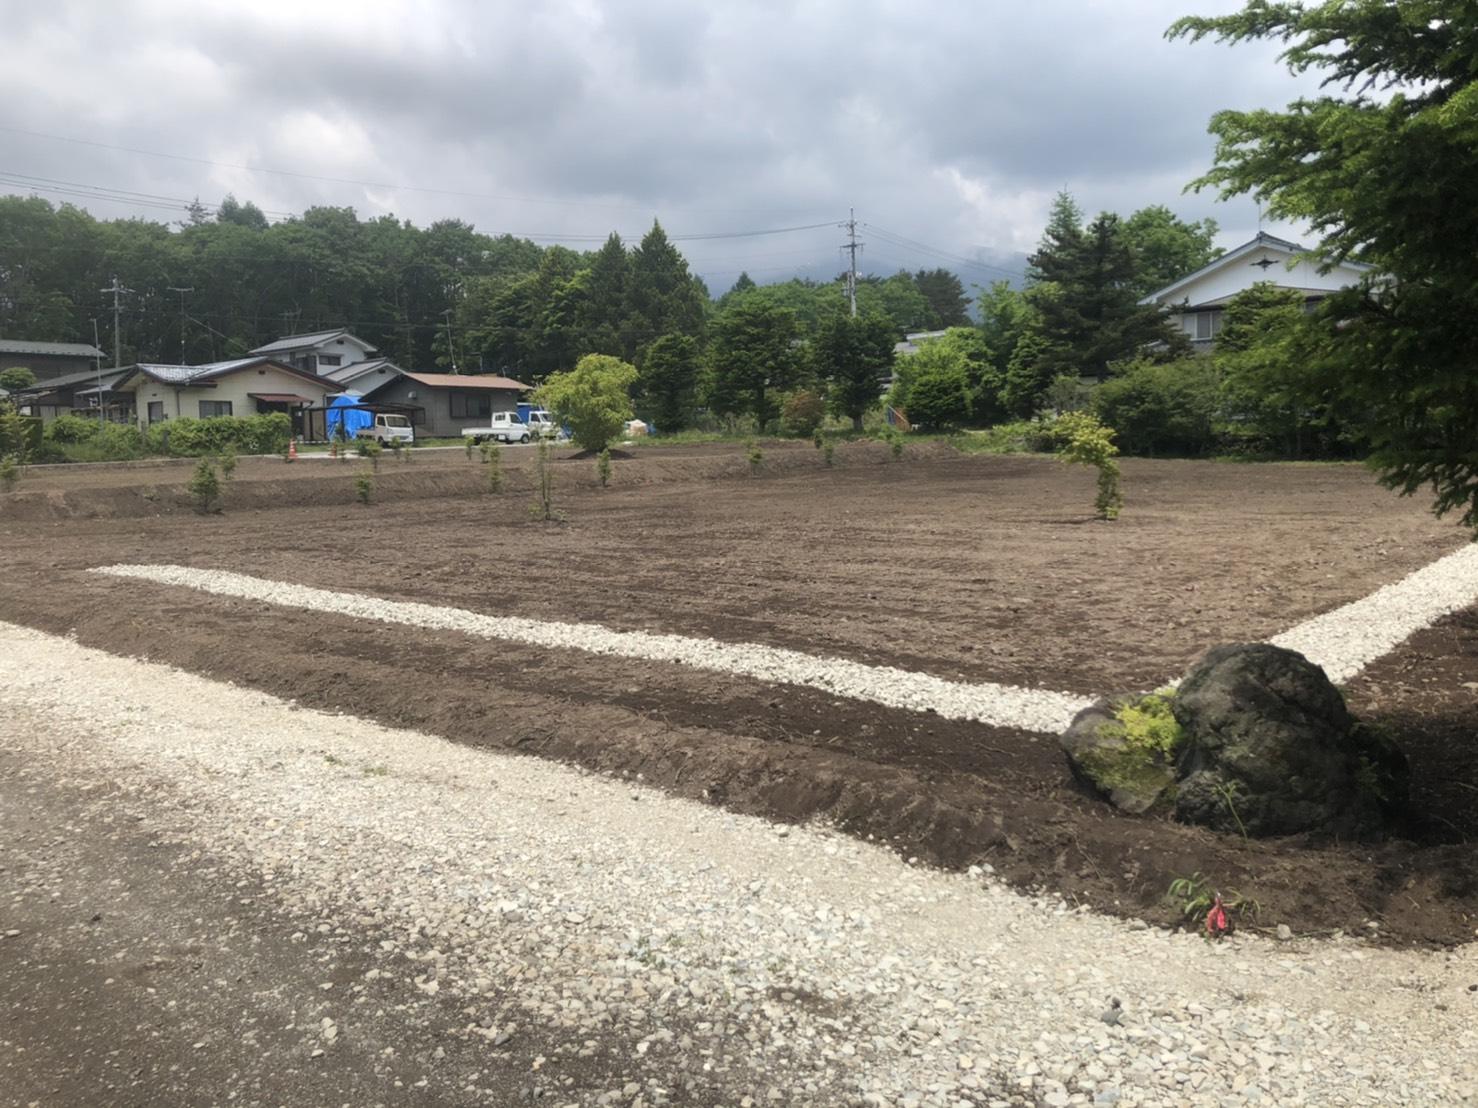 【柳宿別荘地土地②⑤⑦】日常の利便性に優れた土地